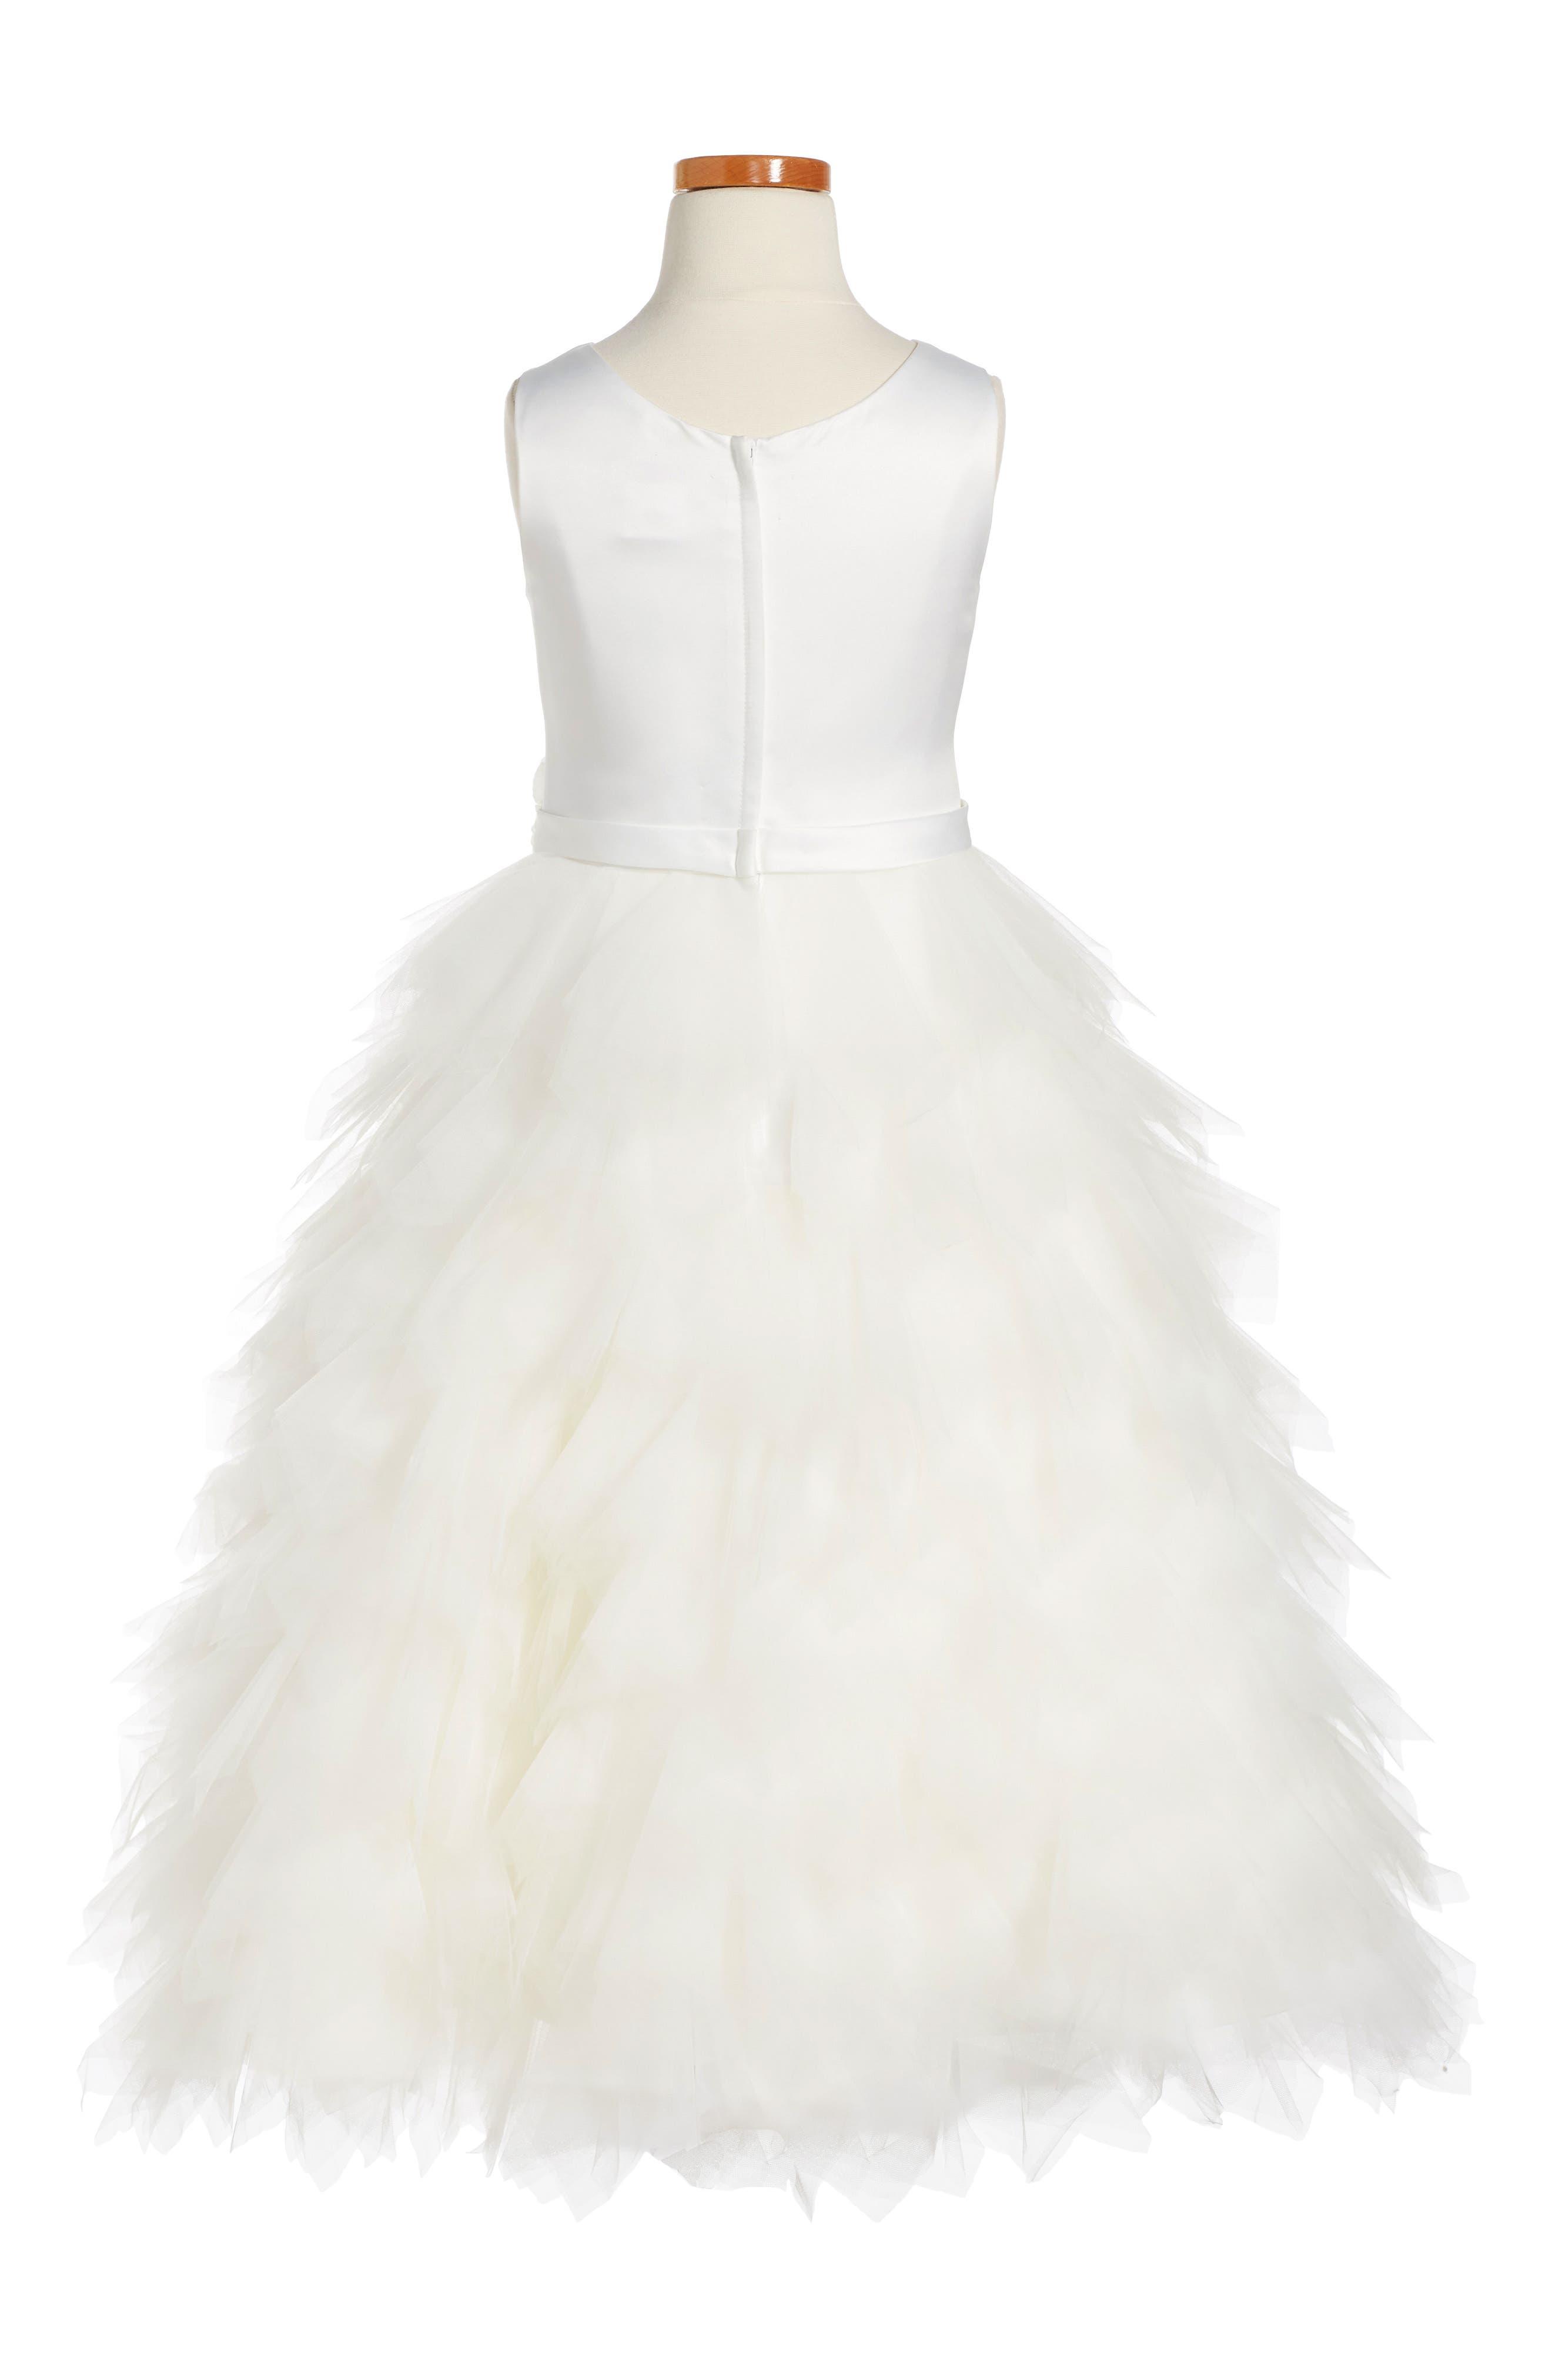 Satin & Tulle Dress,                             Alternate thumbnail 2, color,                             102